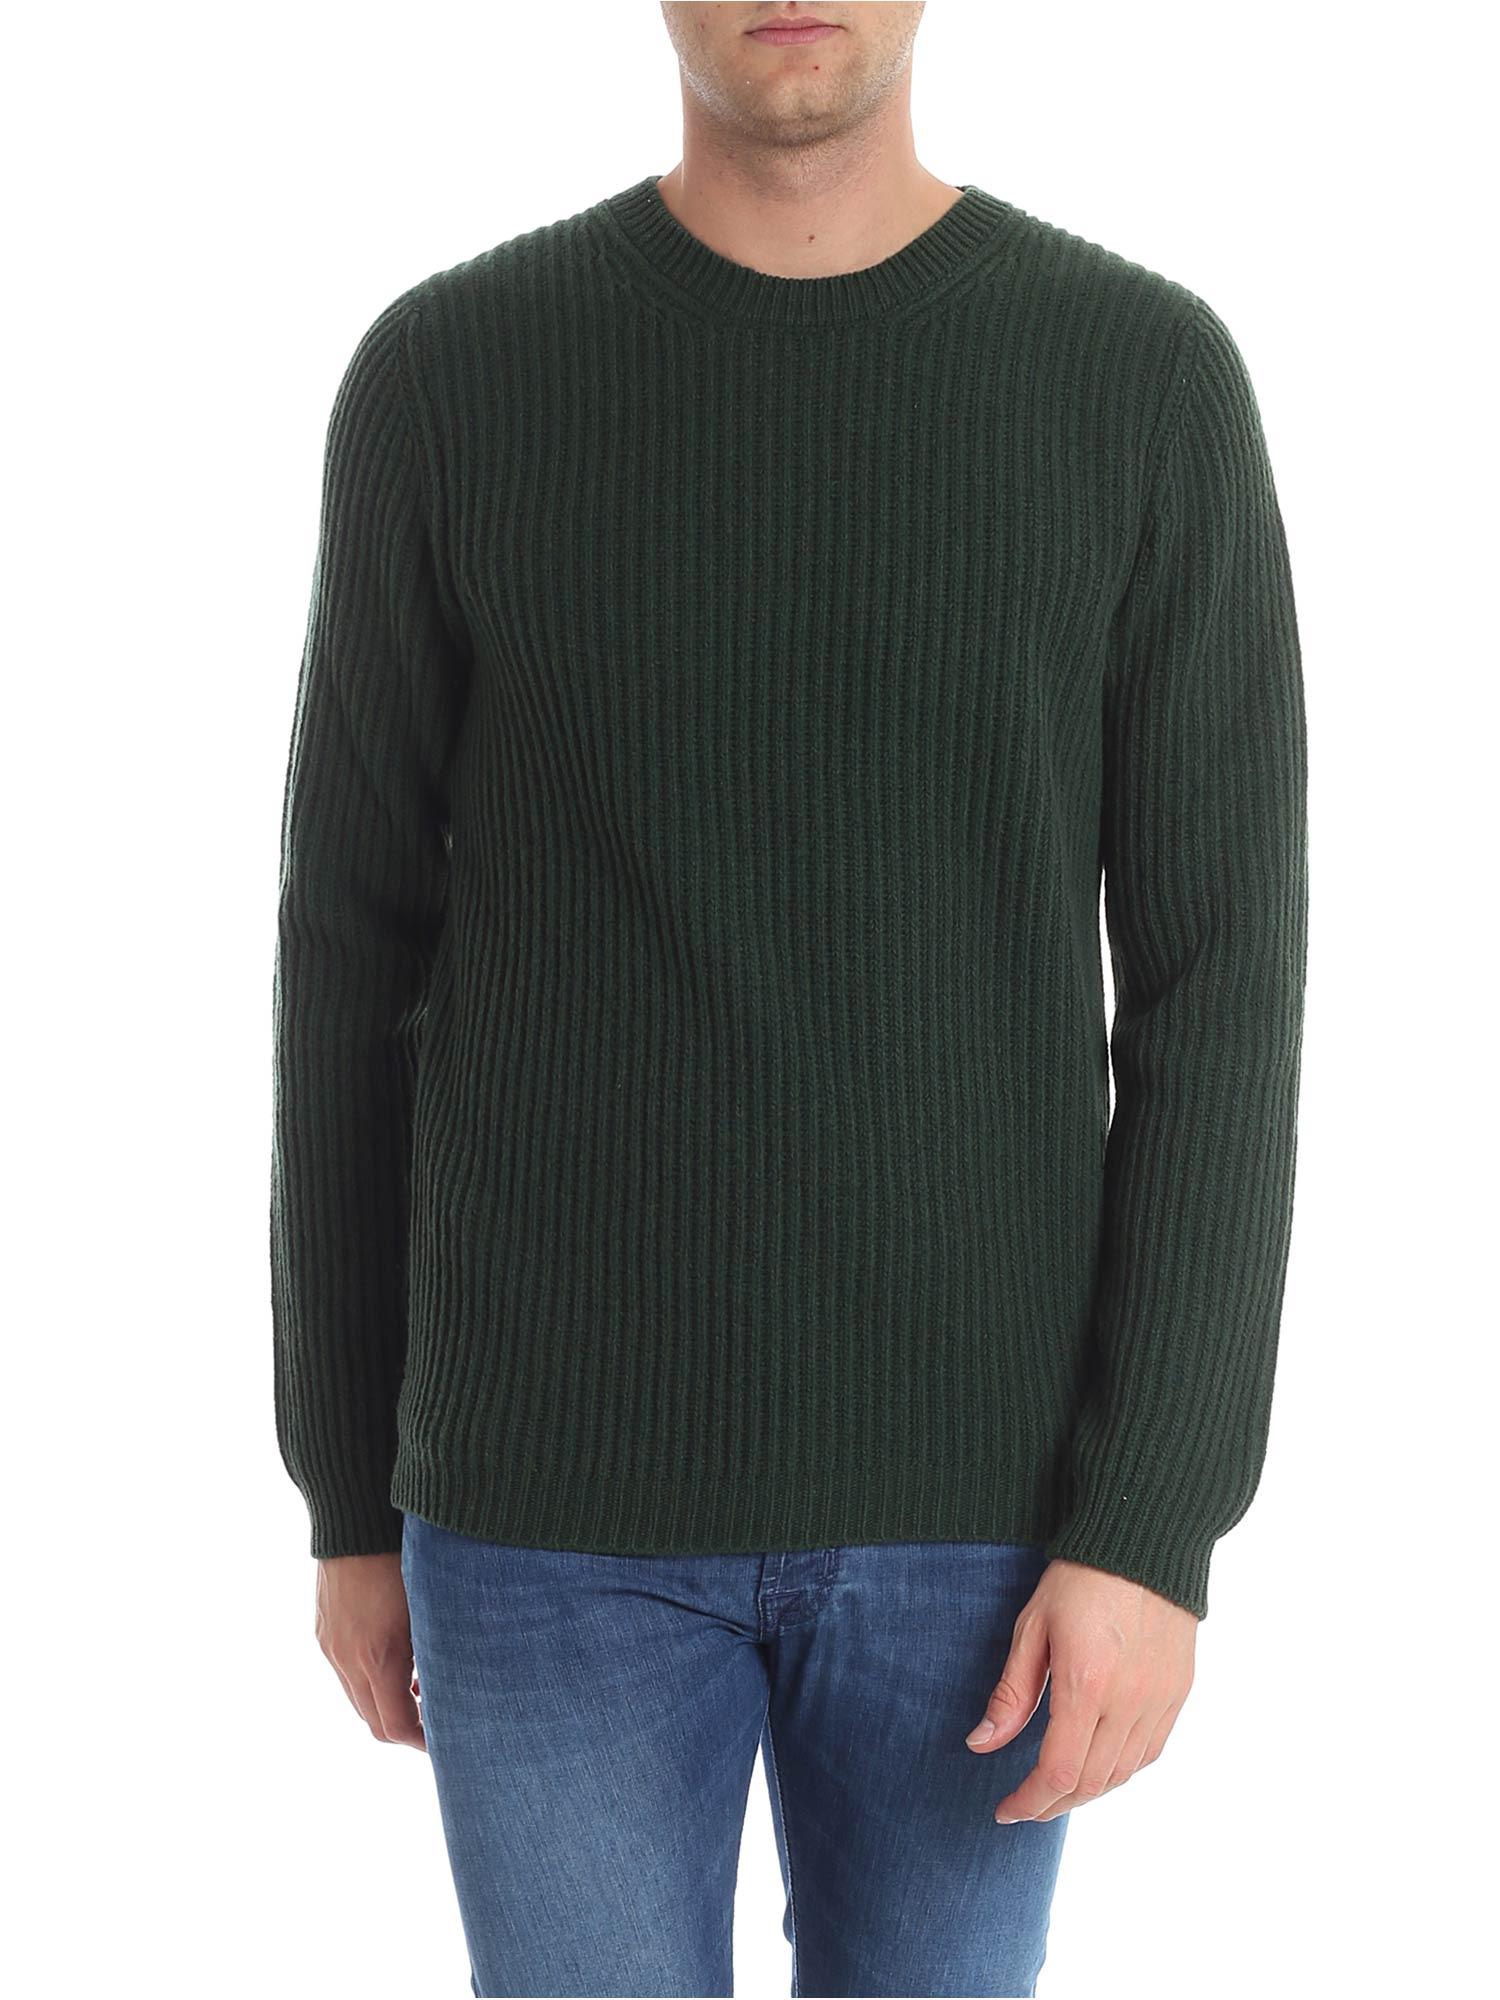 TRUSSARDI Wool Sweater in Green